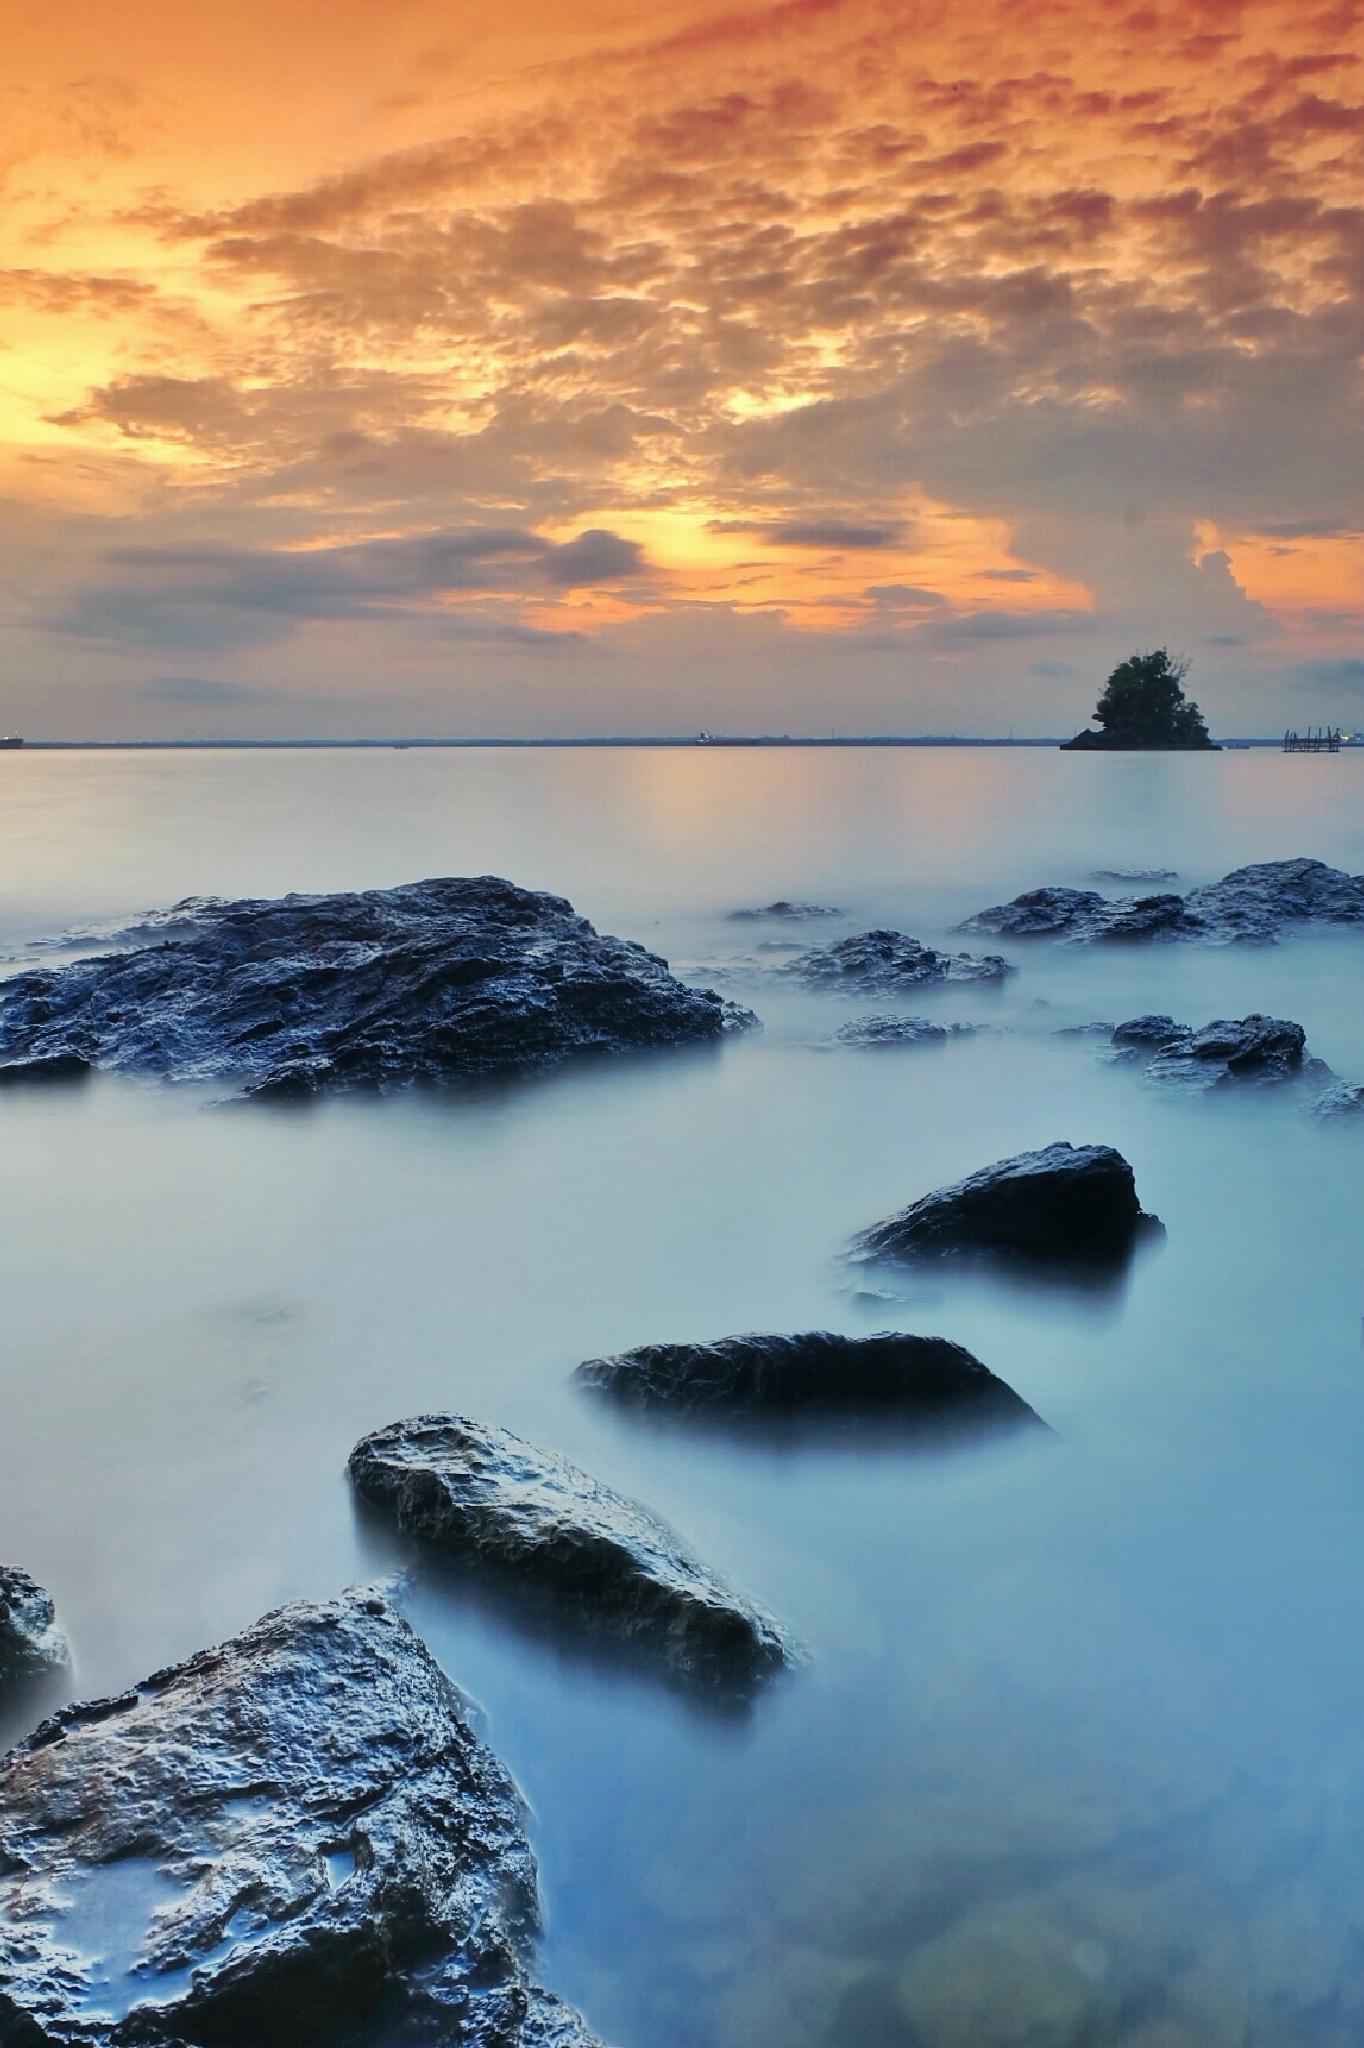 sunset  by aditkoepra